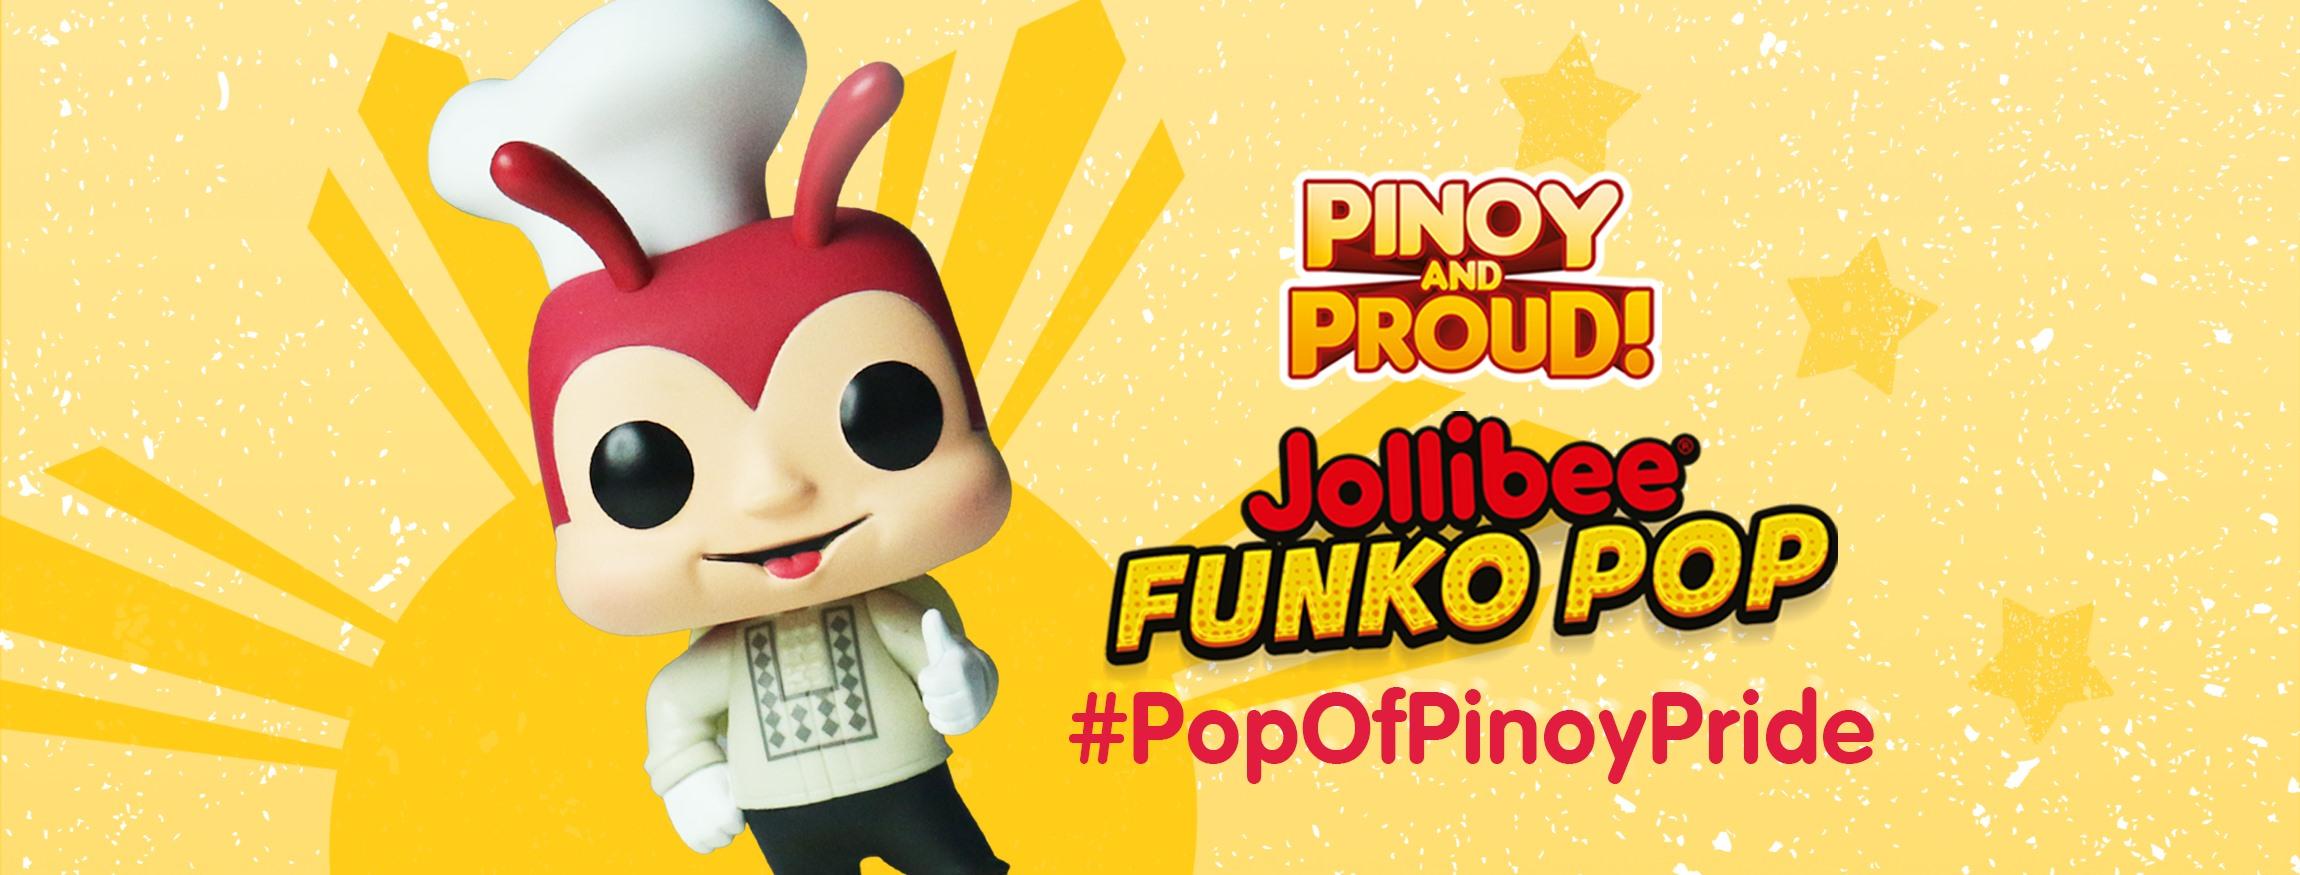 Jollibee in Philippine Barong Funko Pop